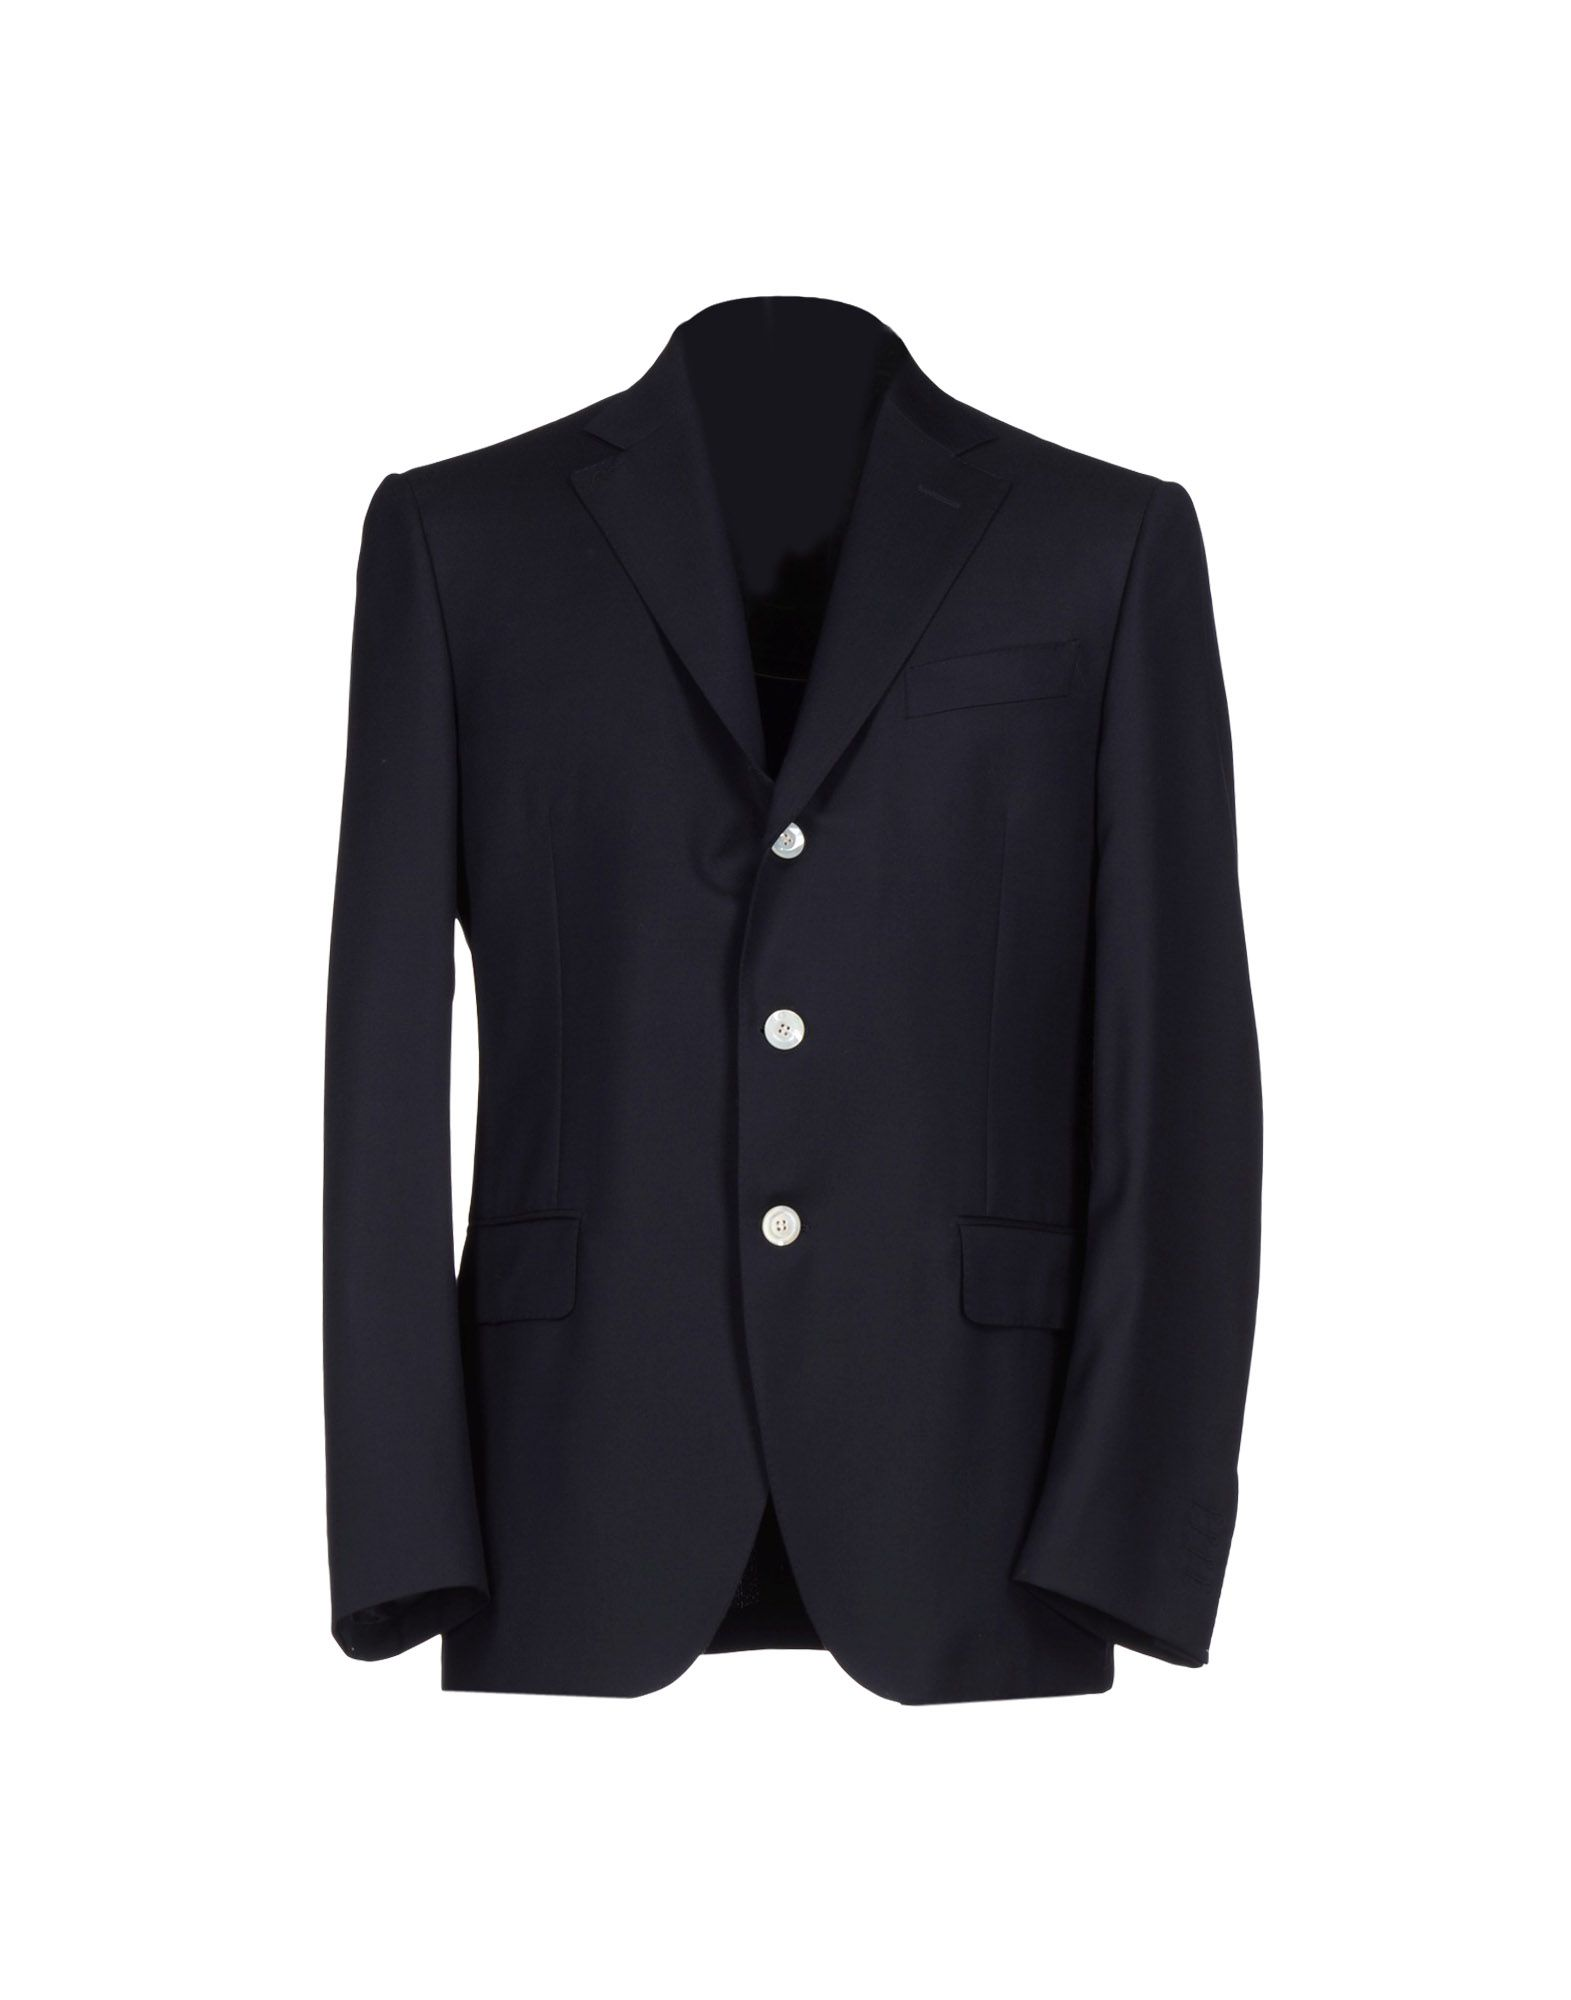 FRANCK BOCLET Blazer in Dark Blue